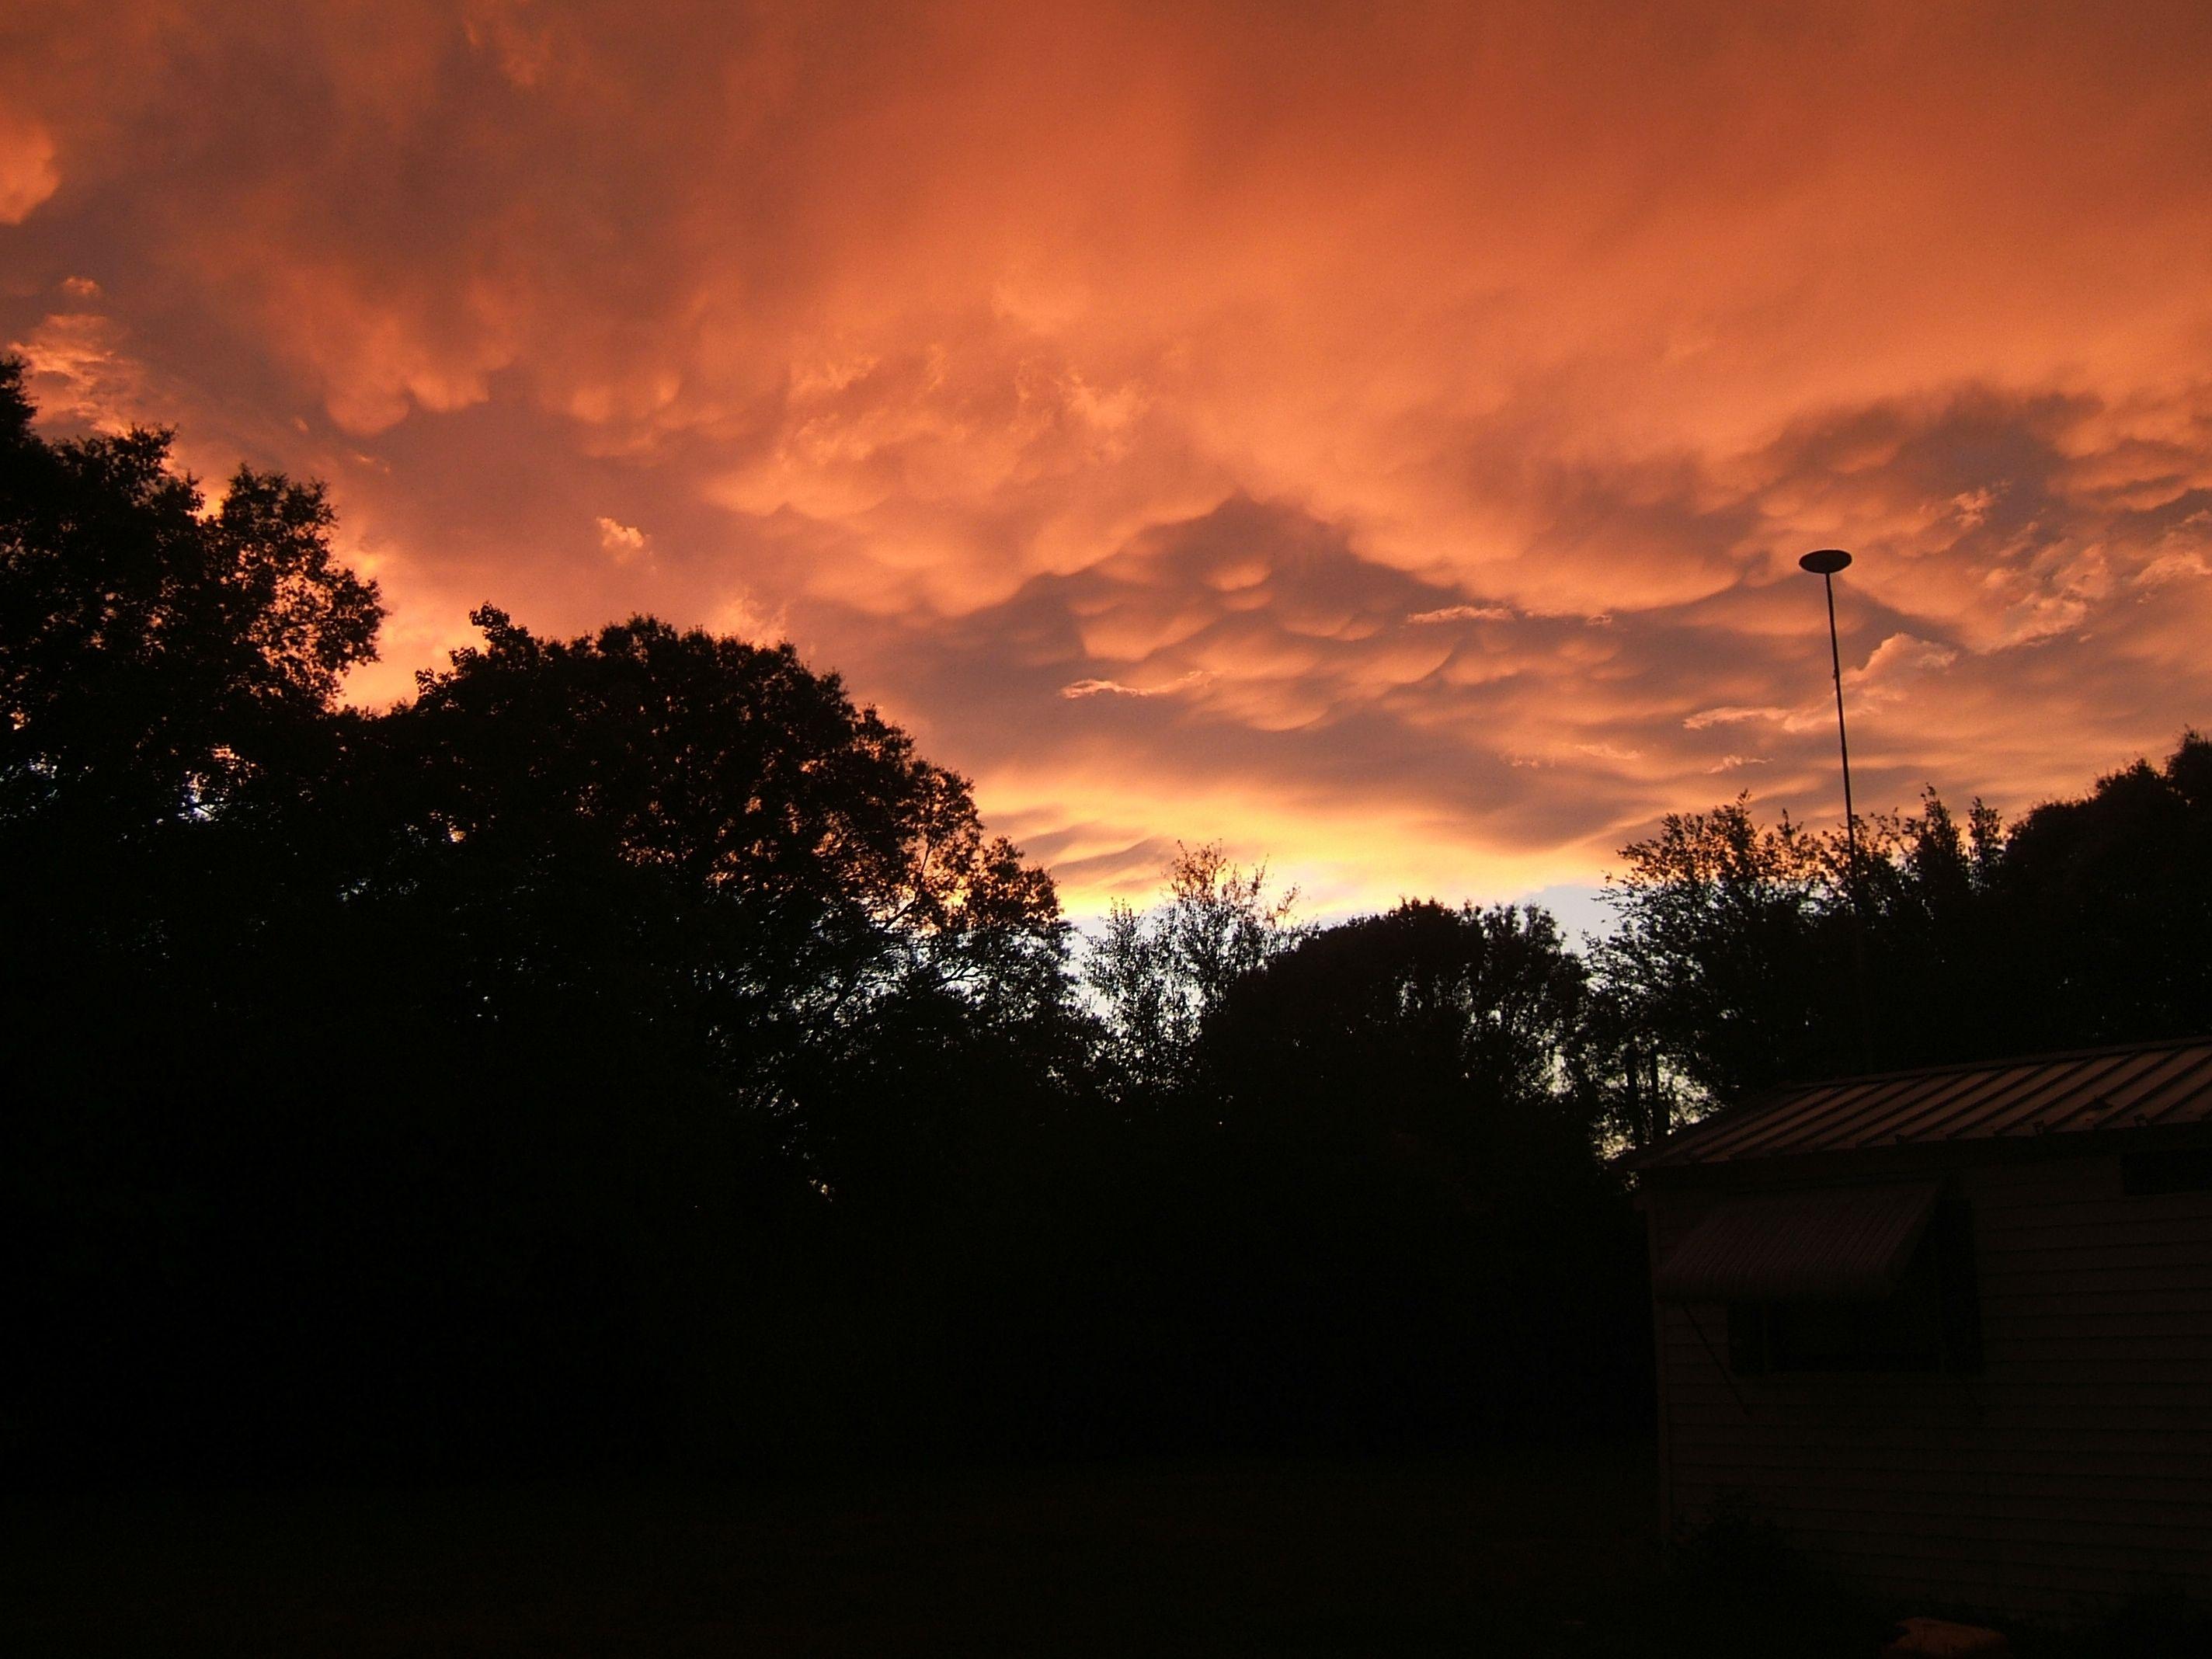 Sunset vs. Storm. (Dade City, Florida. 5/24/12) Dade